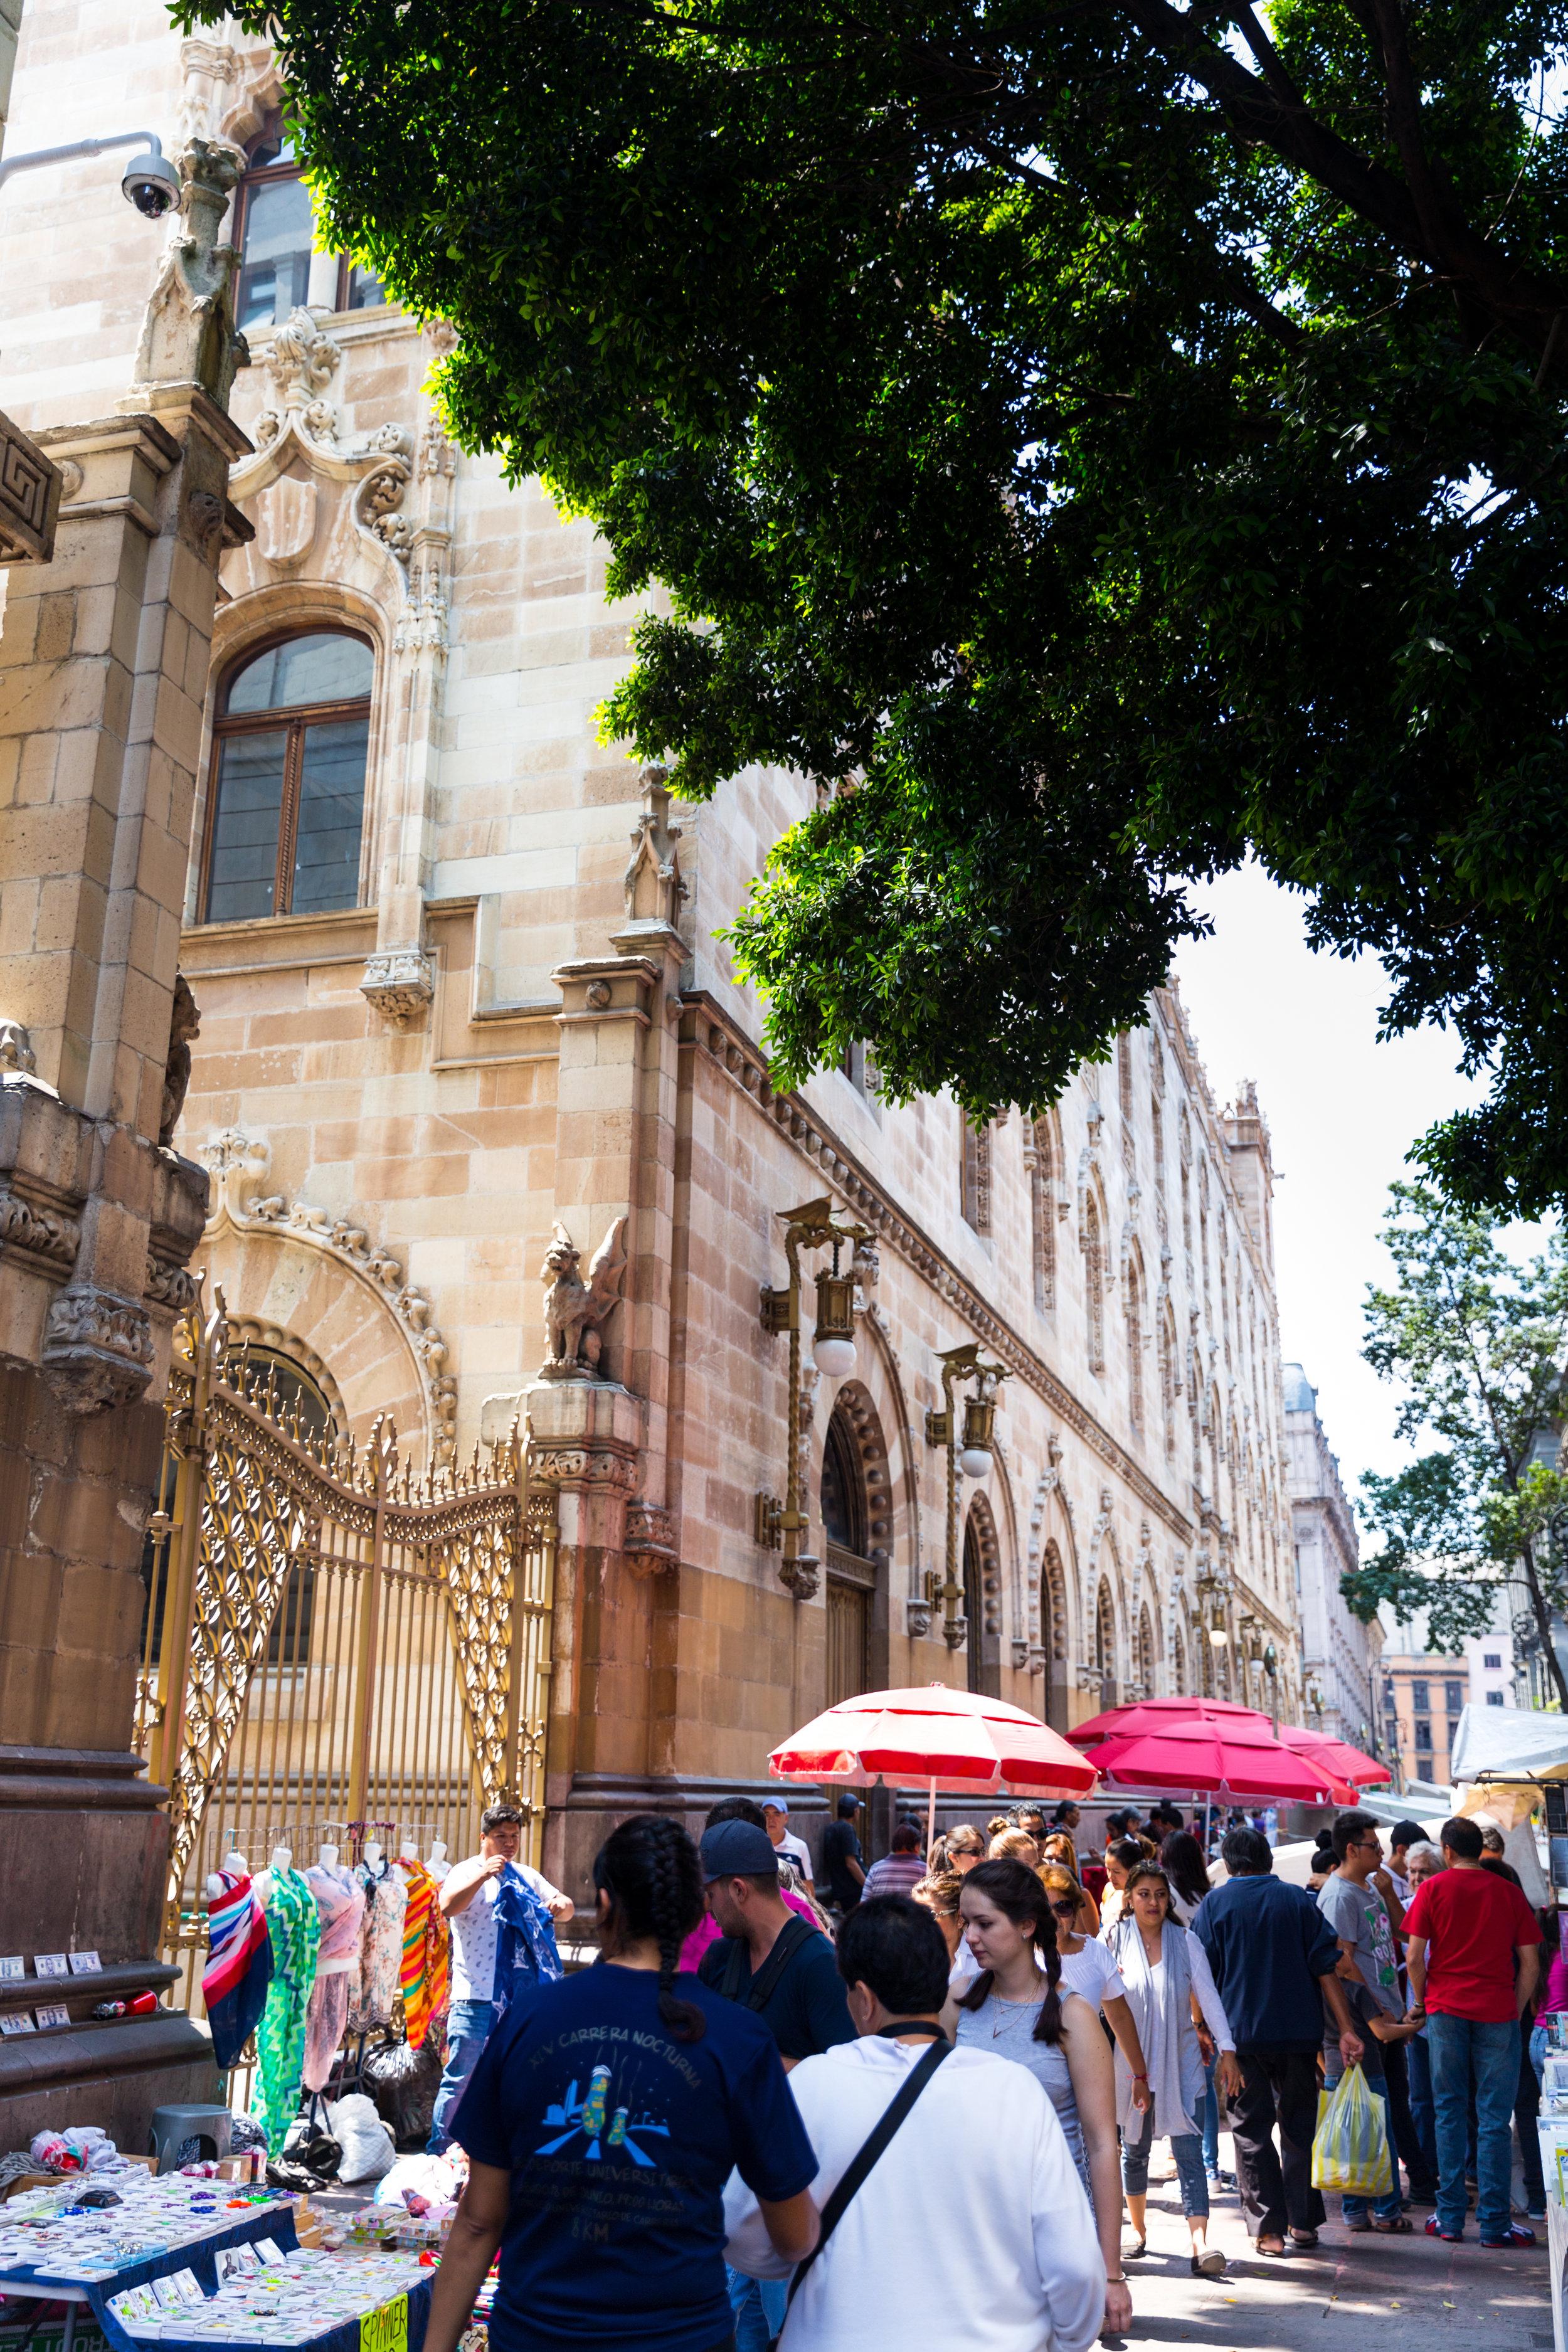 Mexico City Centro Historico-18.jpg